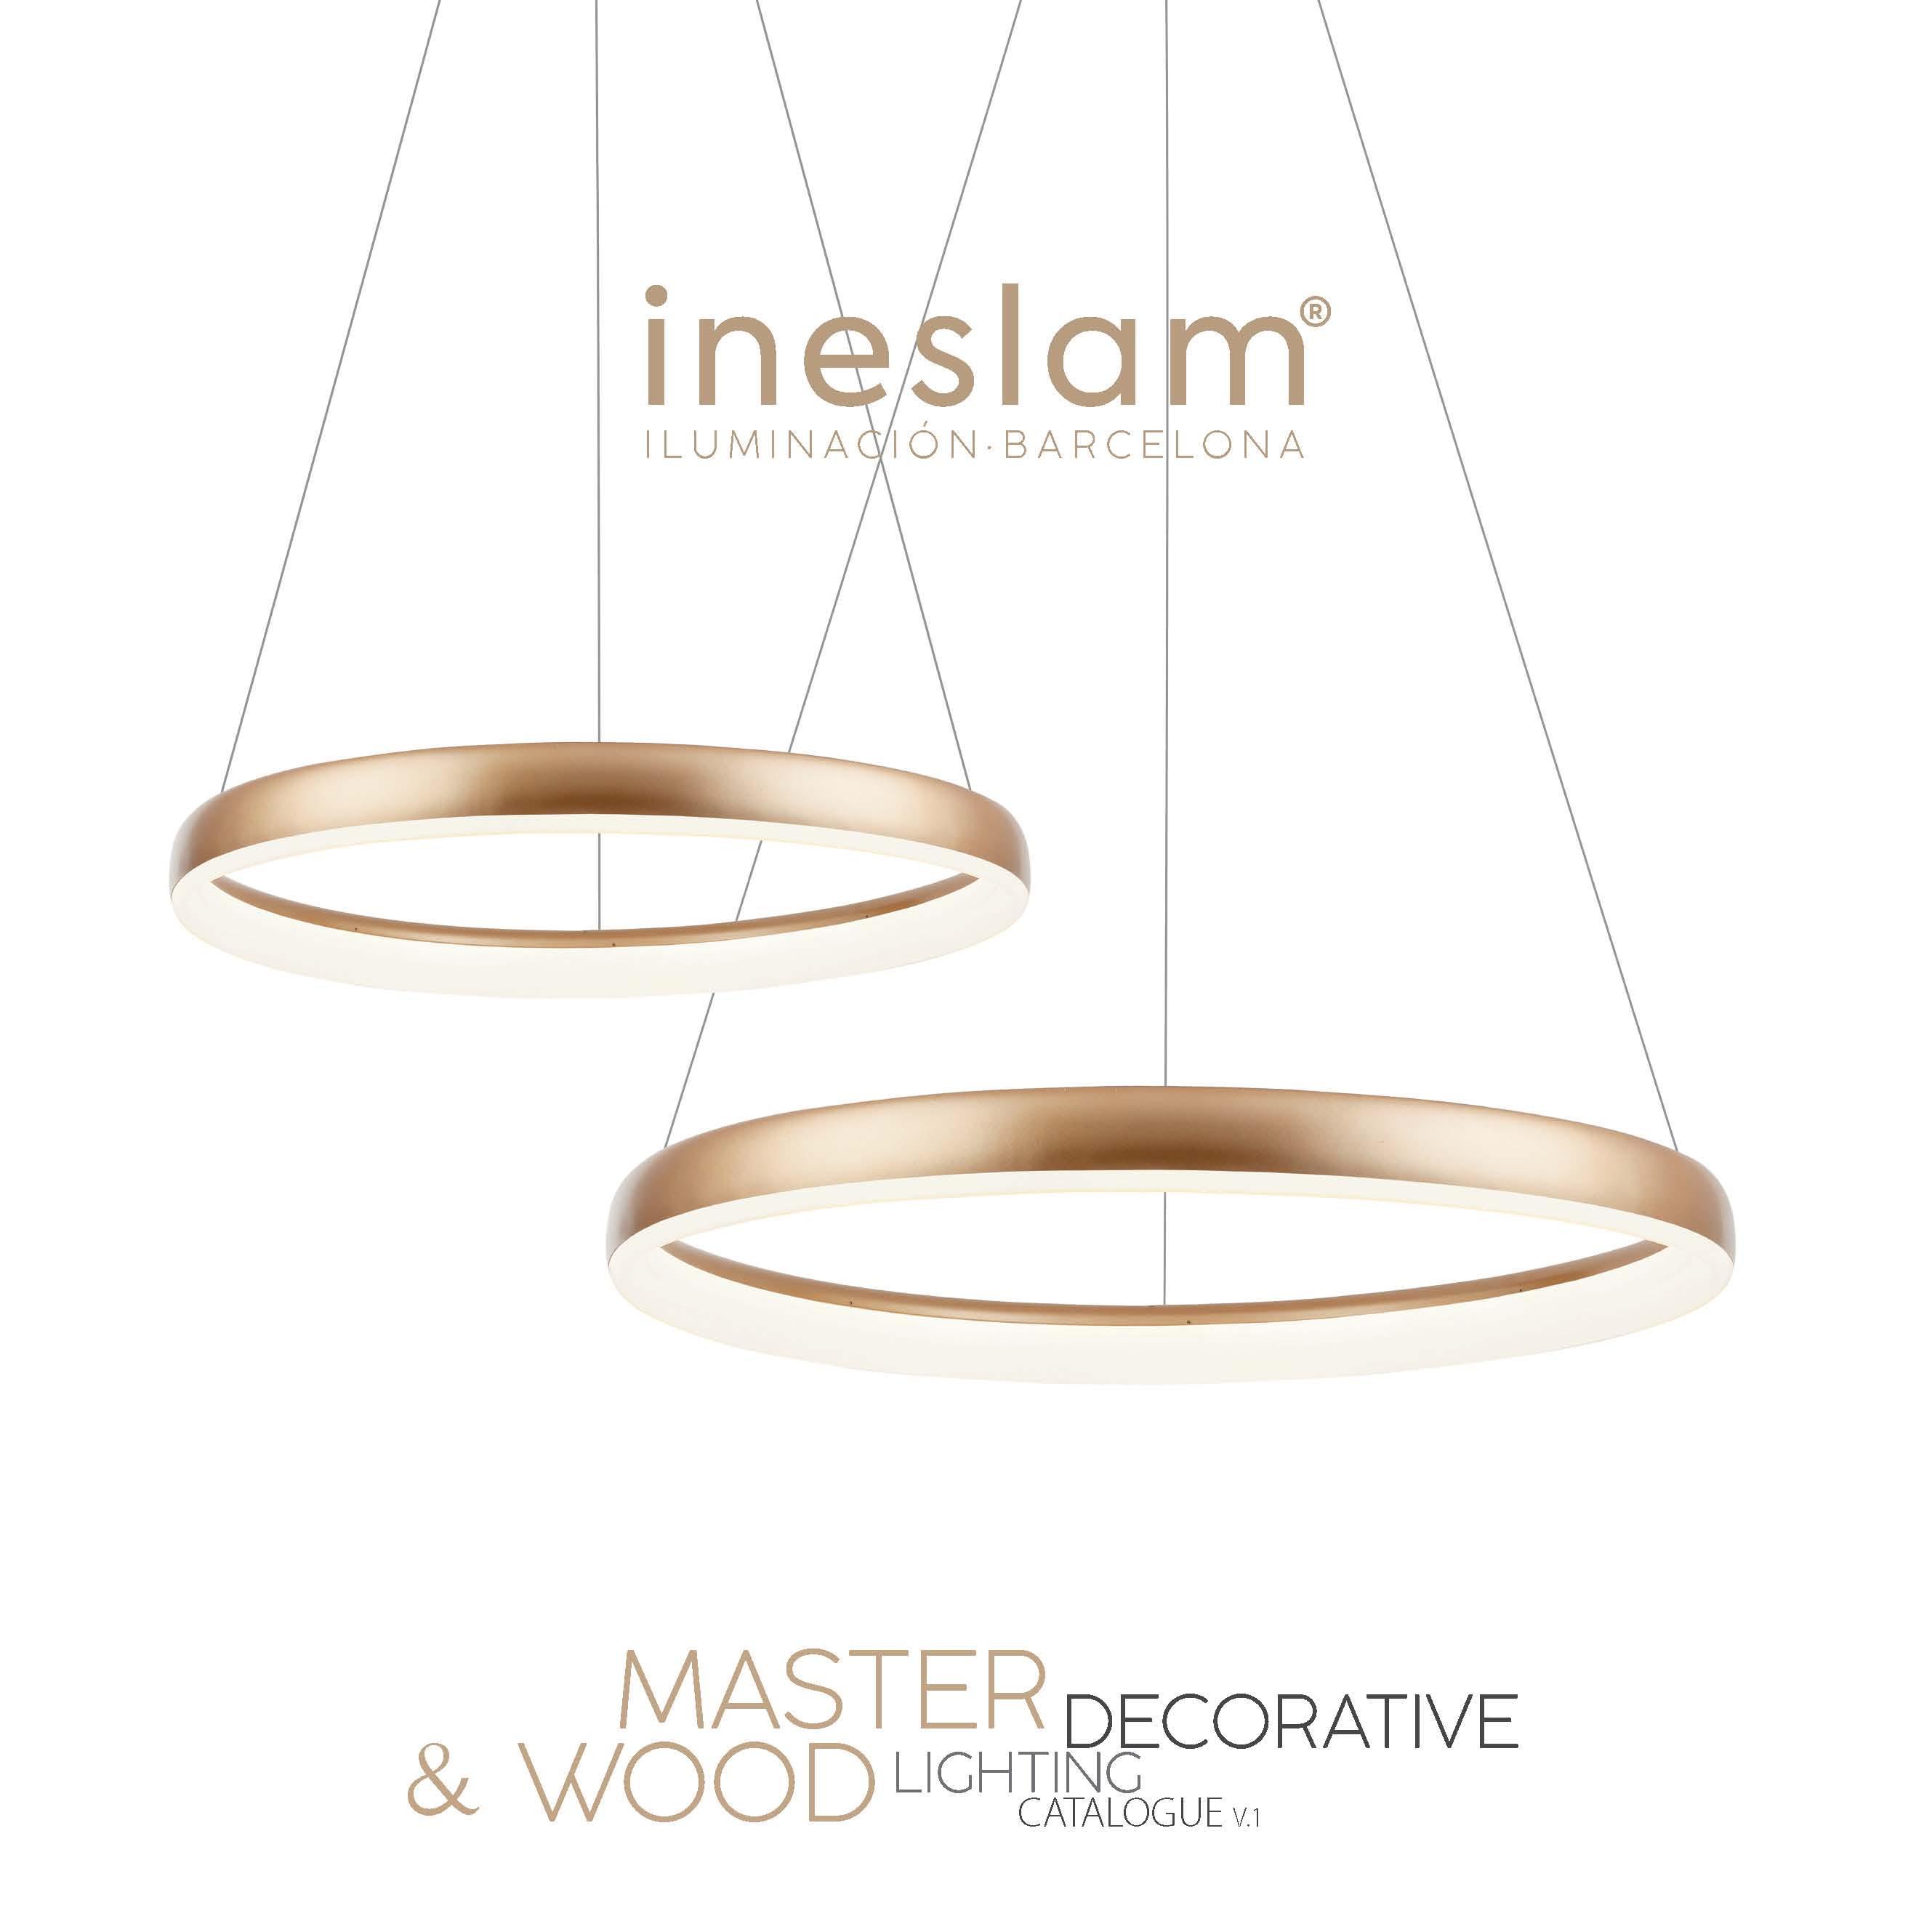 ineslam lighting